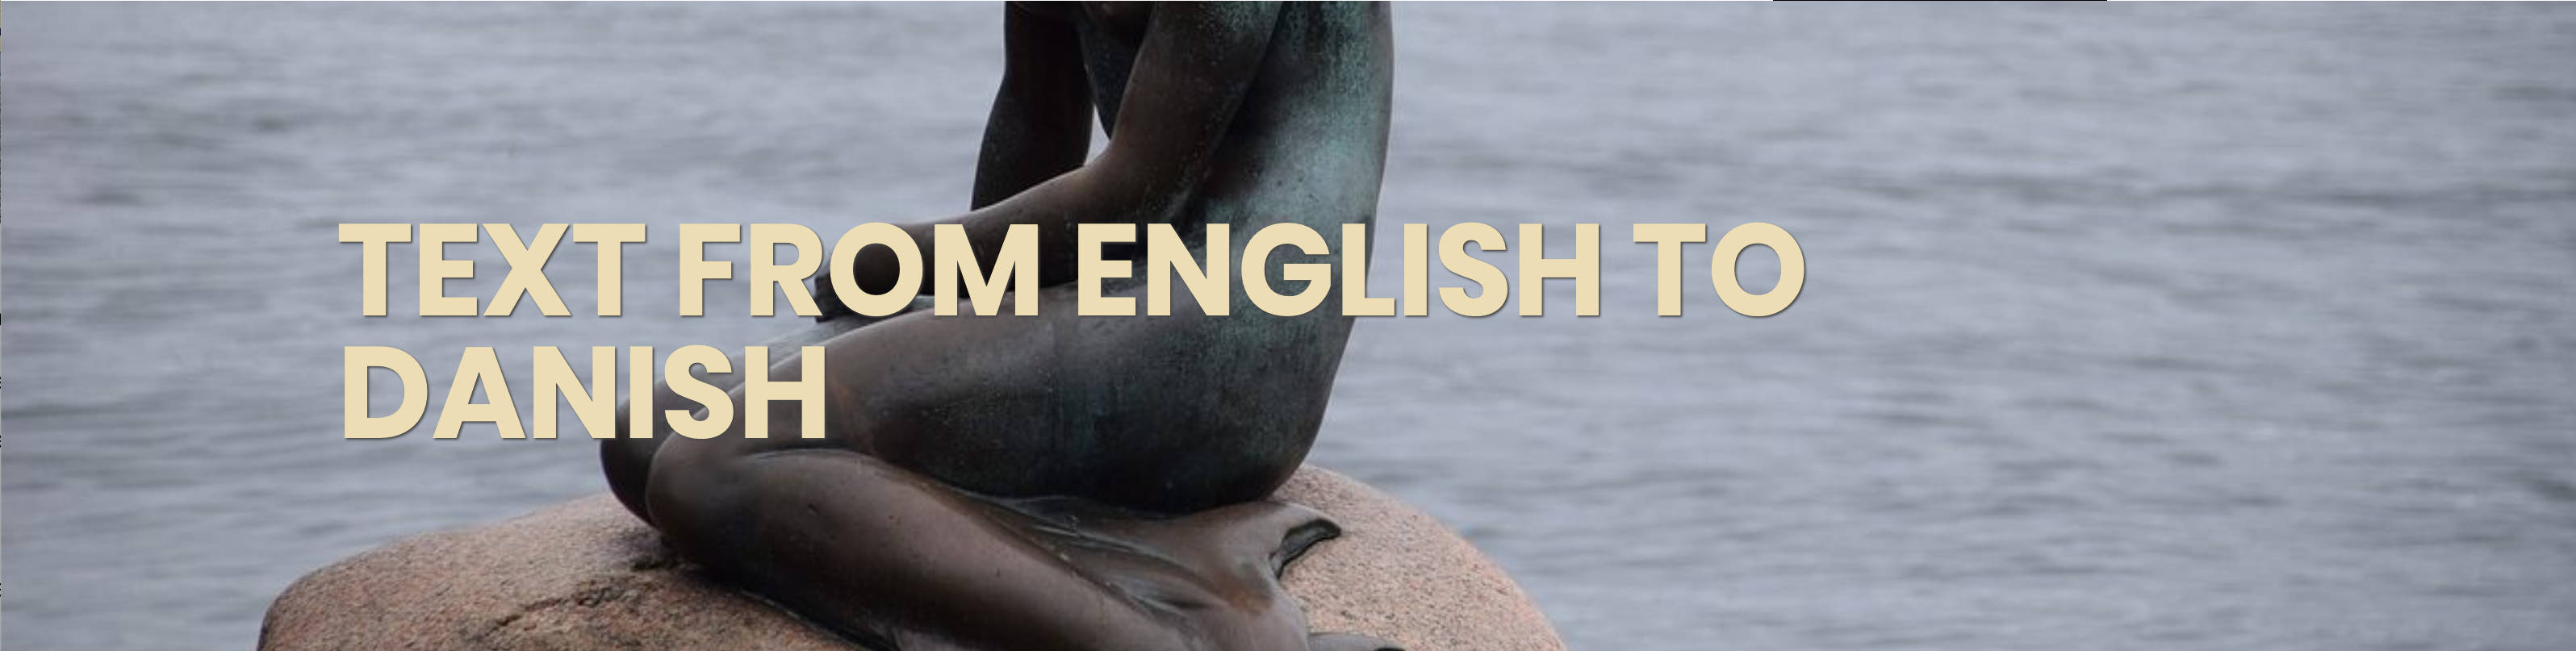 Translation from English to Danish